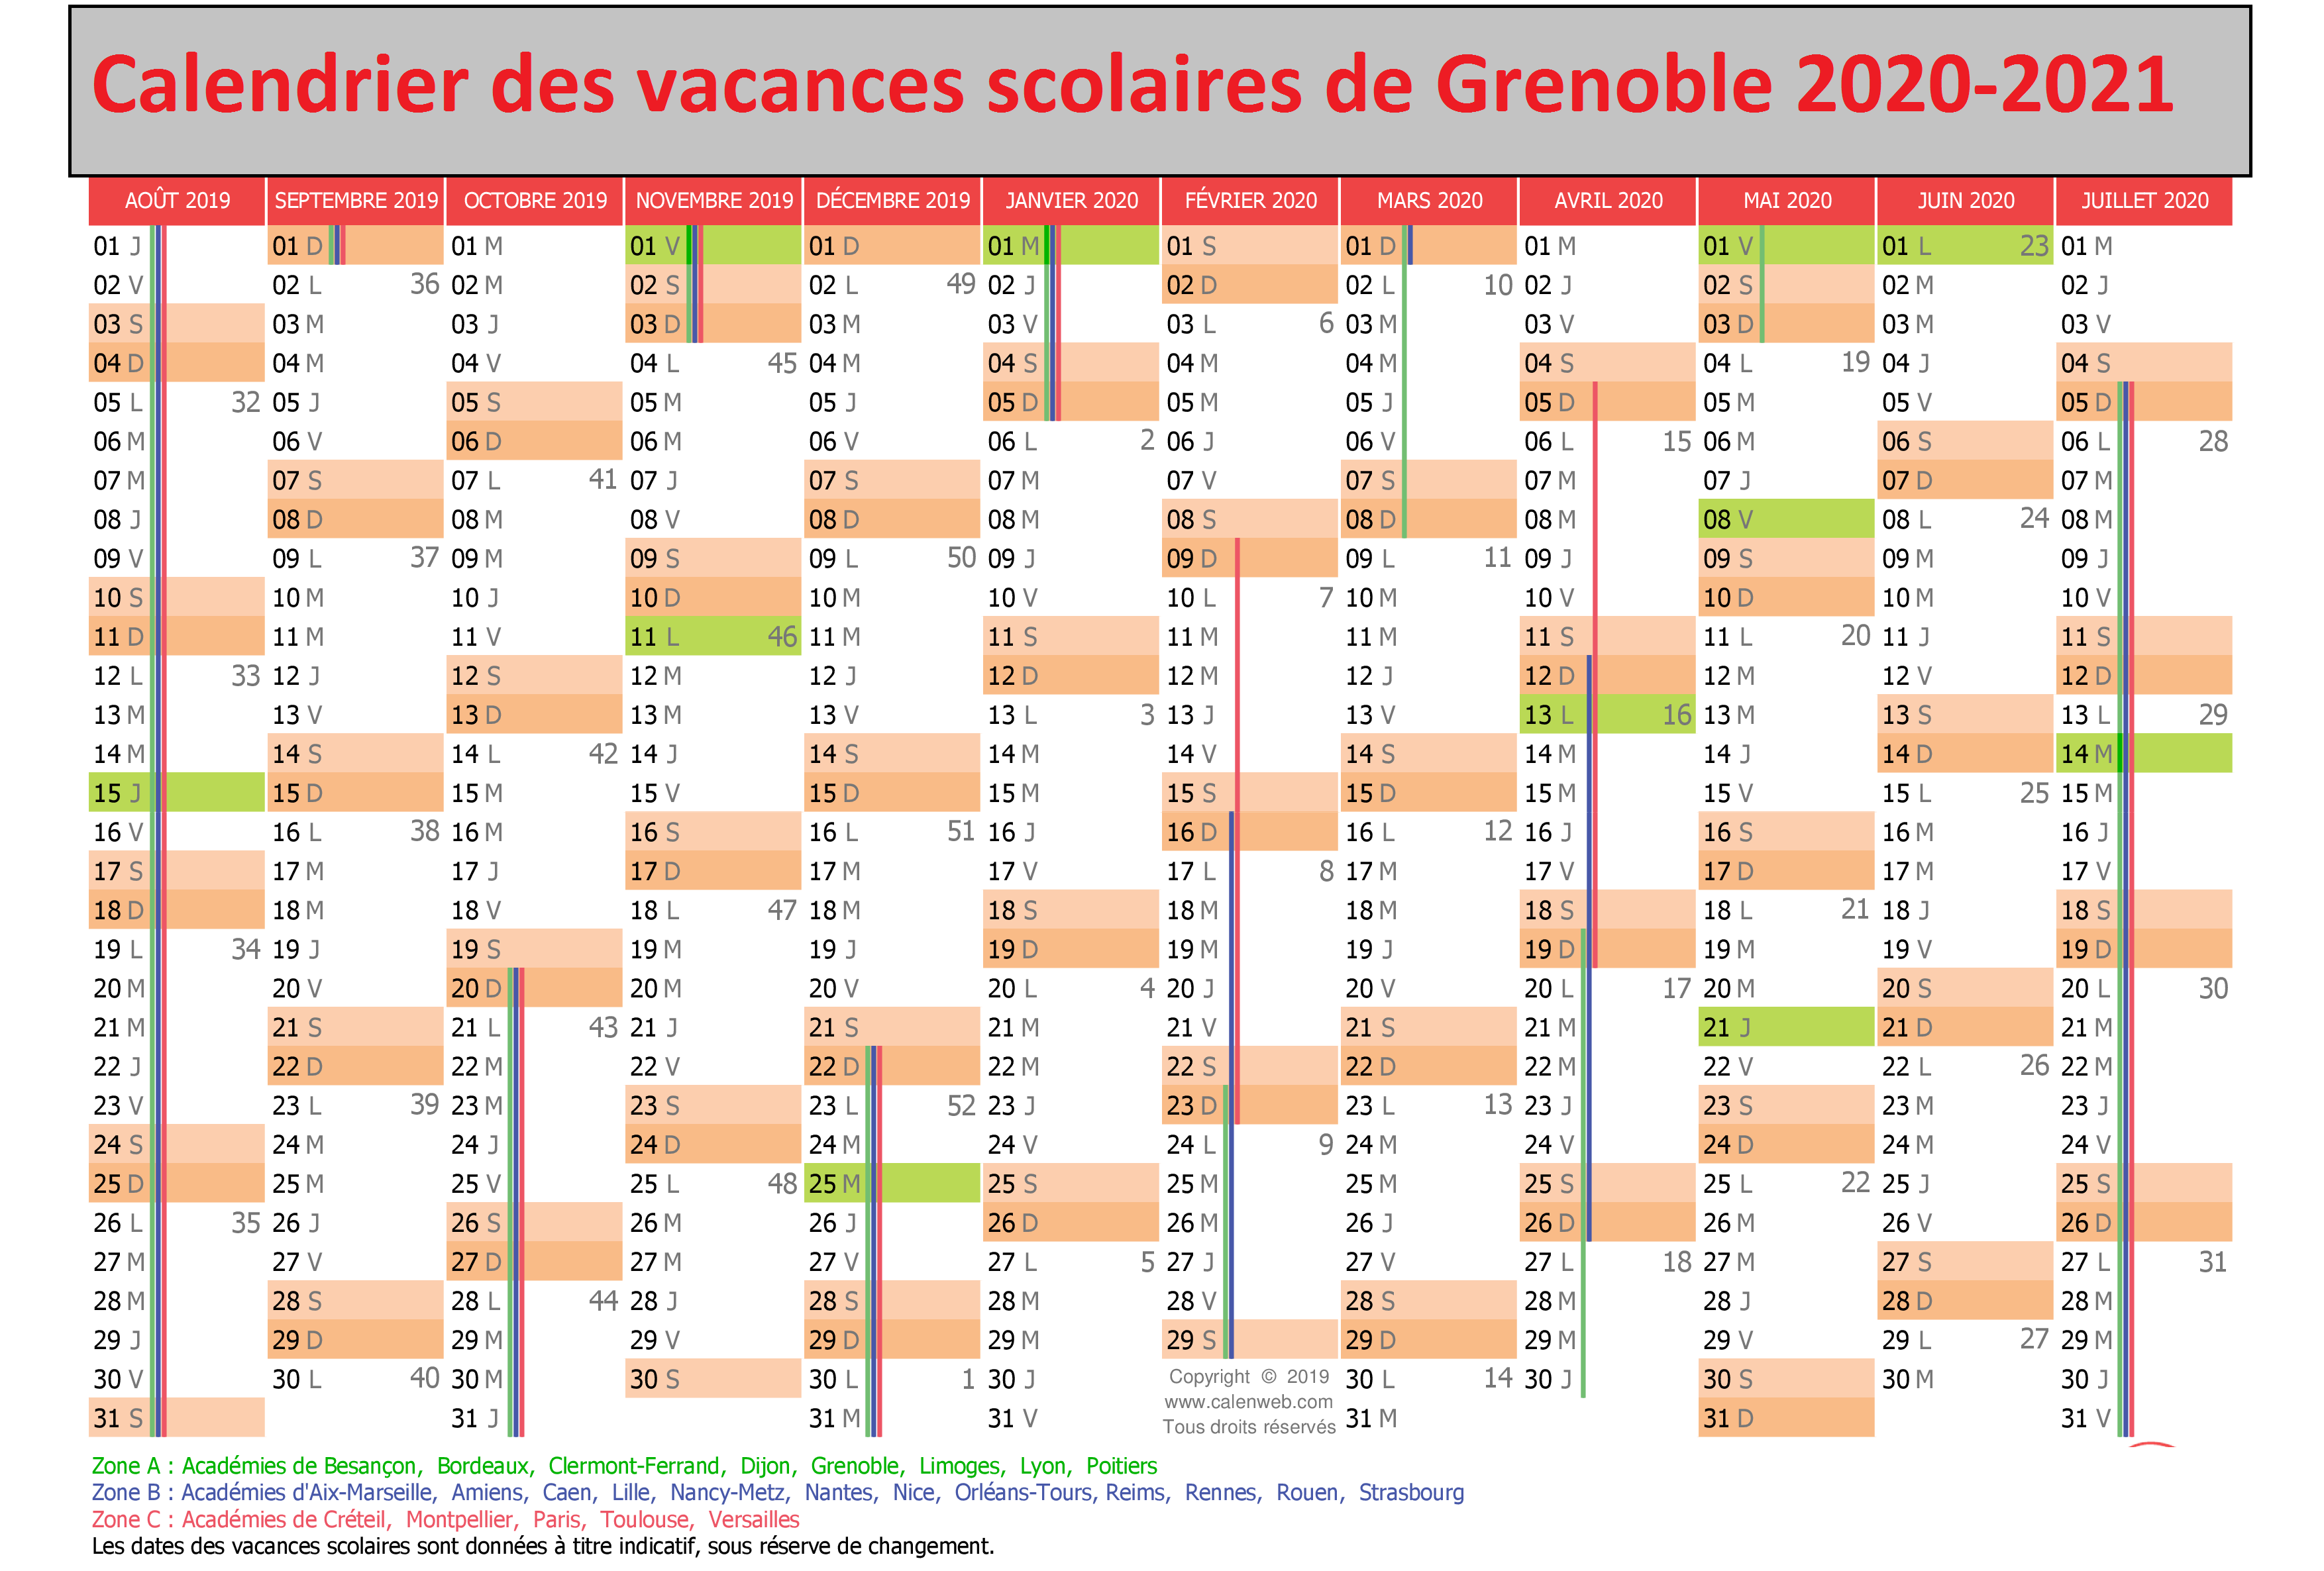 Dates Calendrier Vacances Scolaires 2020 Grenoble